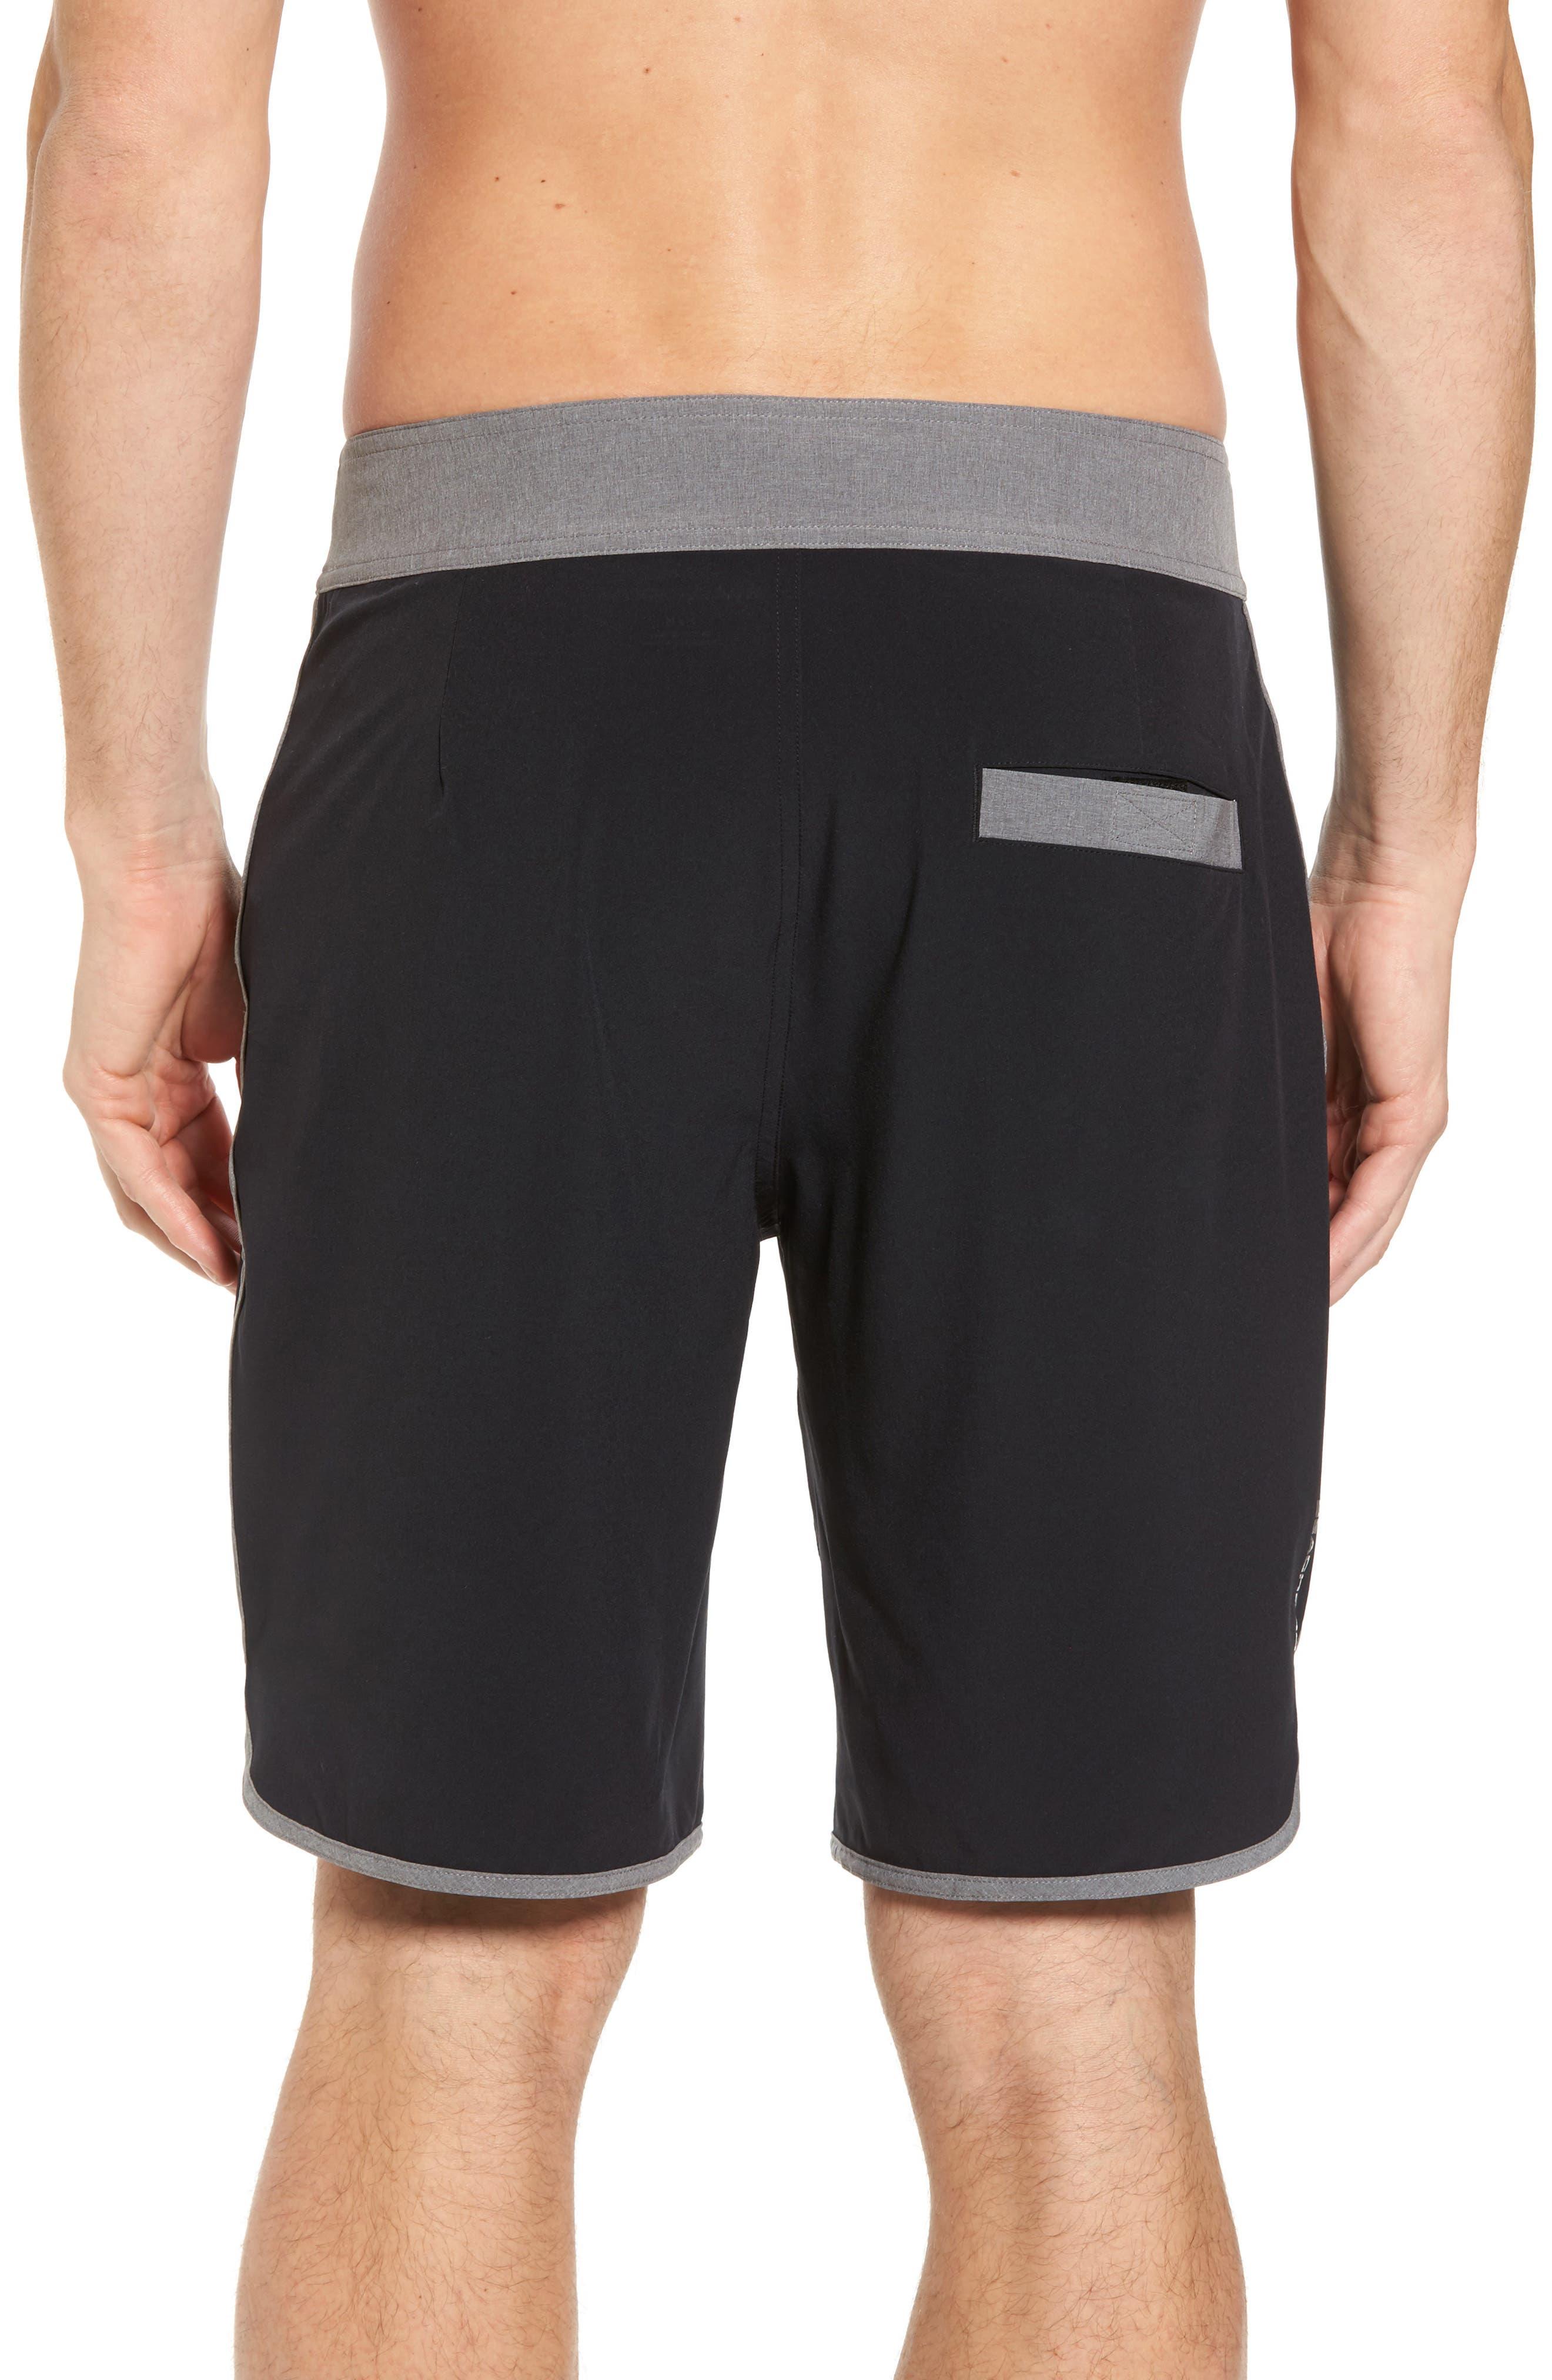 Flex Hybrid Athletic Shorts,                             Alternate thumbnail 2, color,                             001